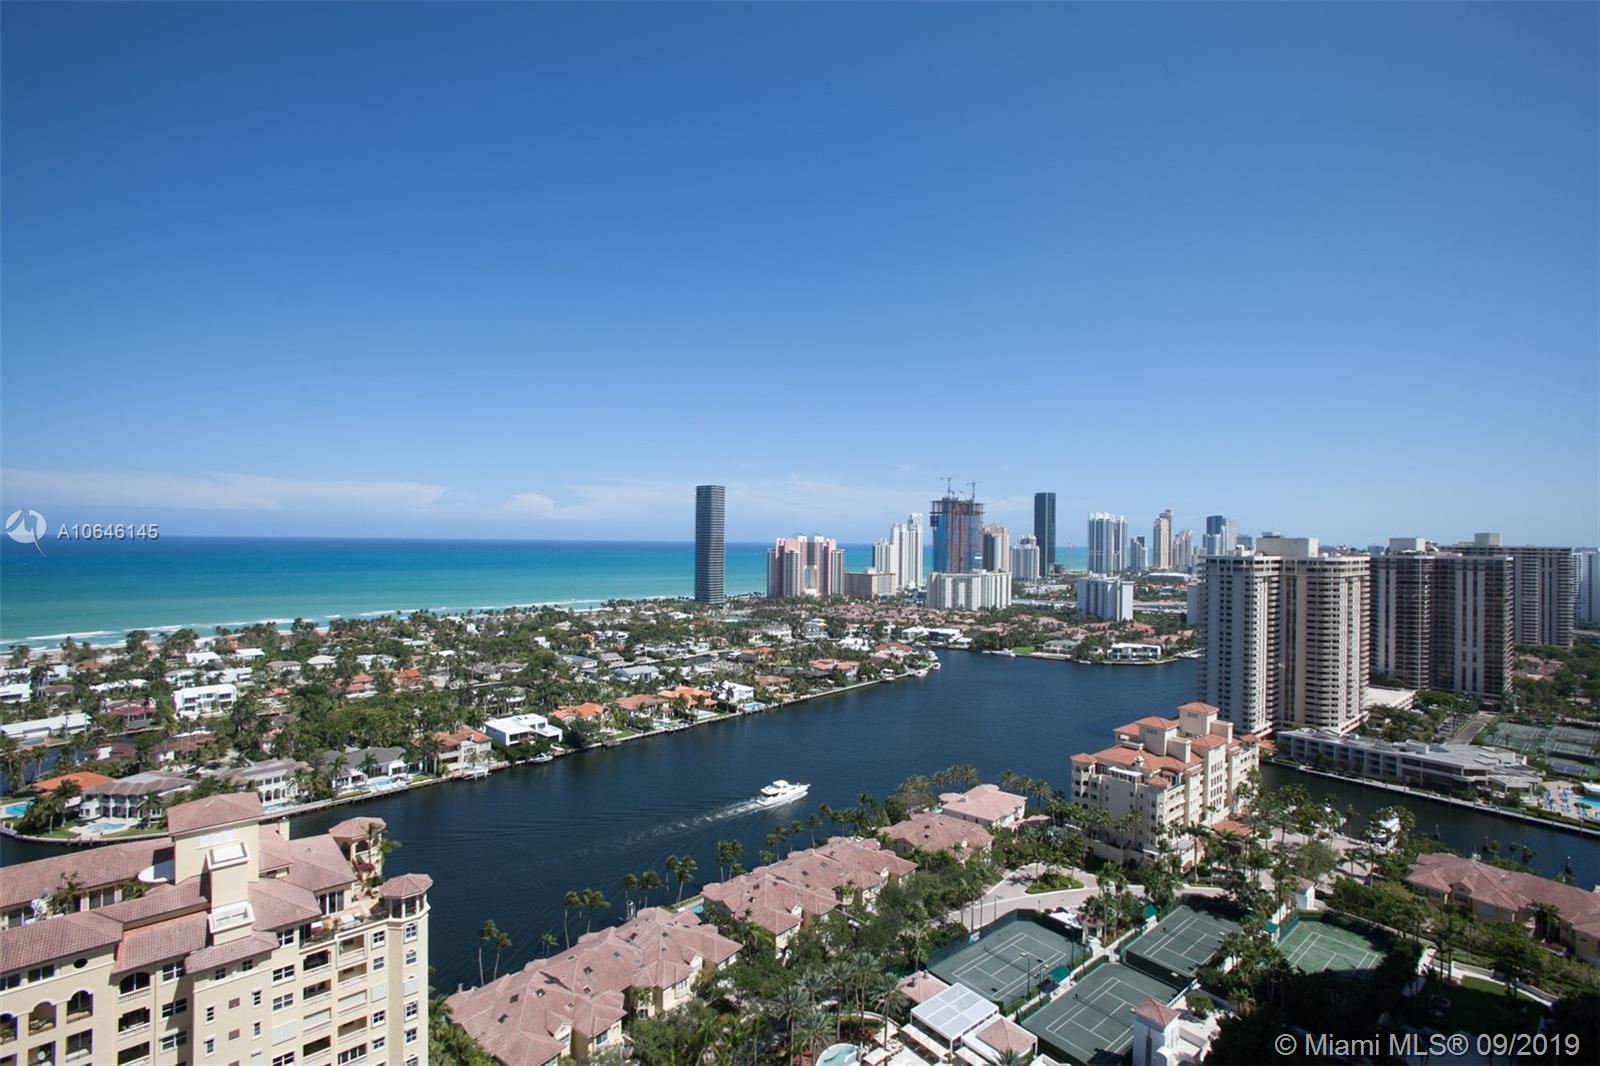 20155 NE 38 CT #1401, Aventura, FL 33180 - Aventura, FL real estate listing